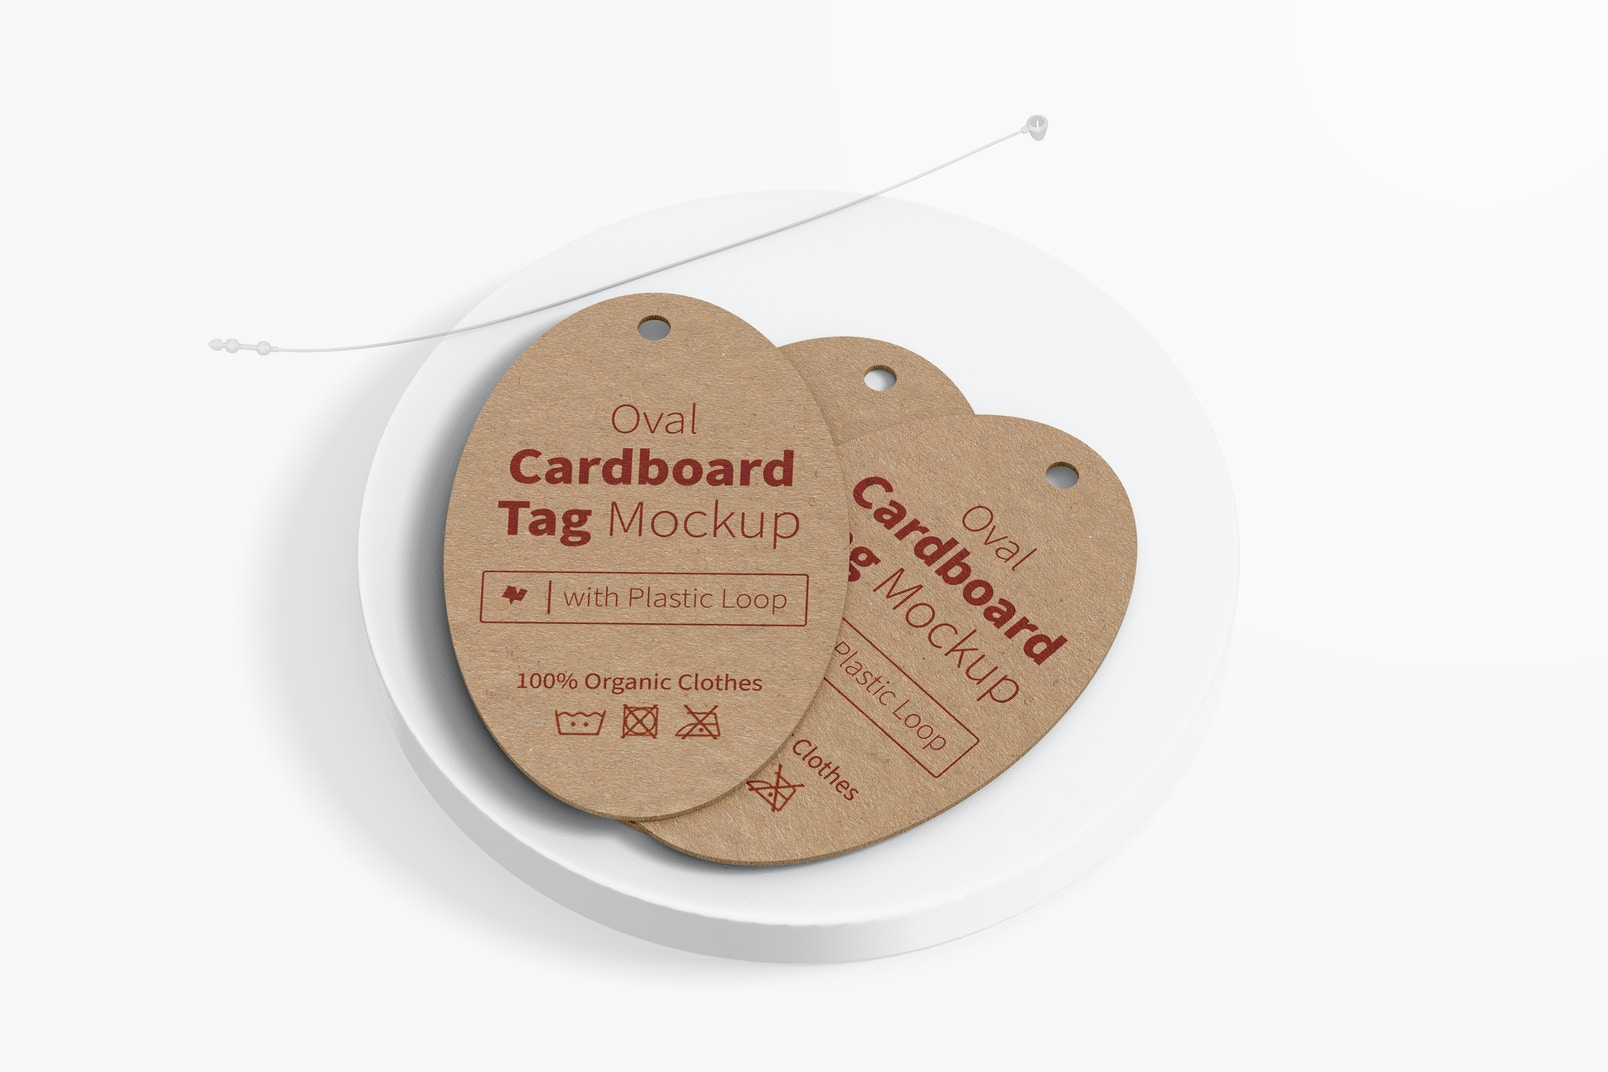 Oval Cardboard Tags with Plastic Loop Mockup, Top View